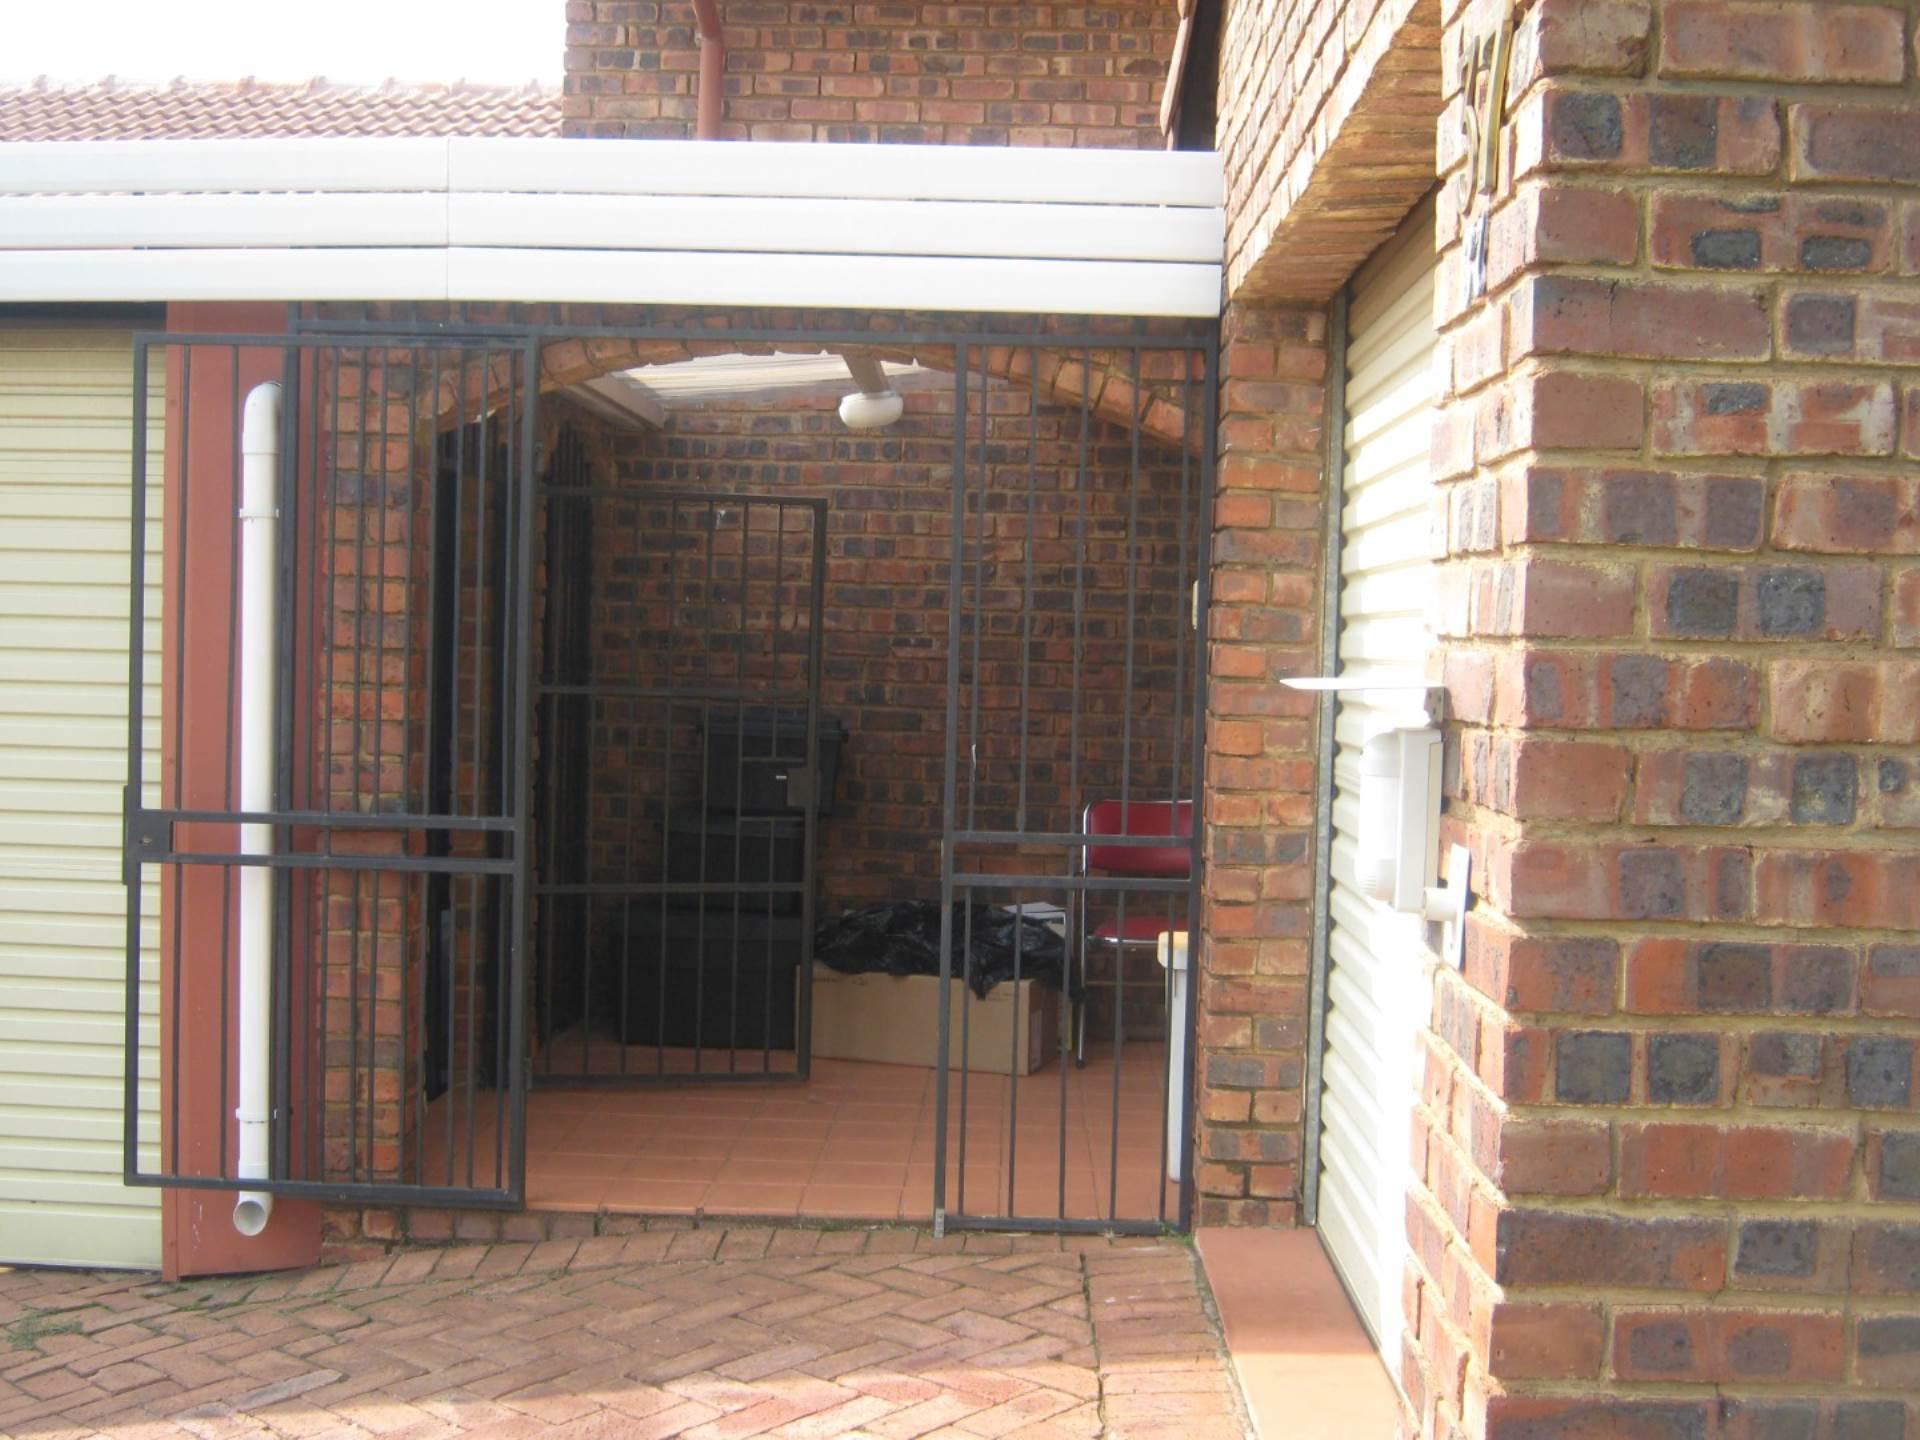 Faerie Glen property for sale. Ref No: 13587462. Picture no 9